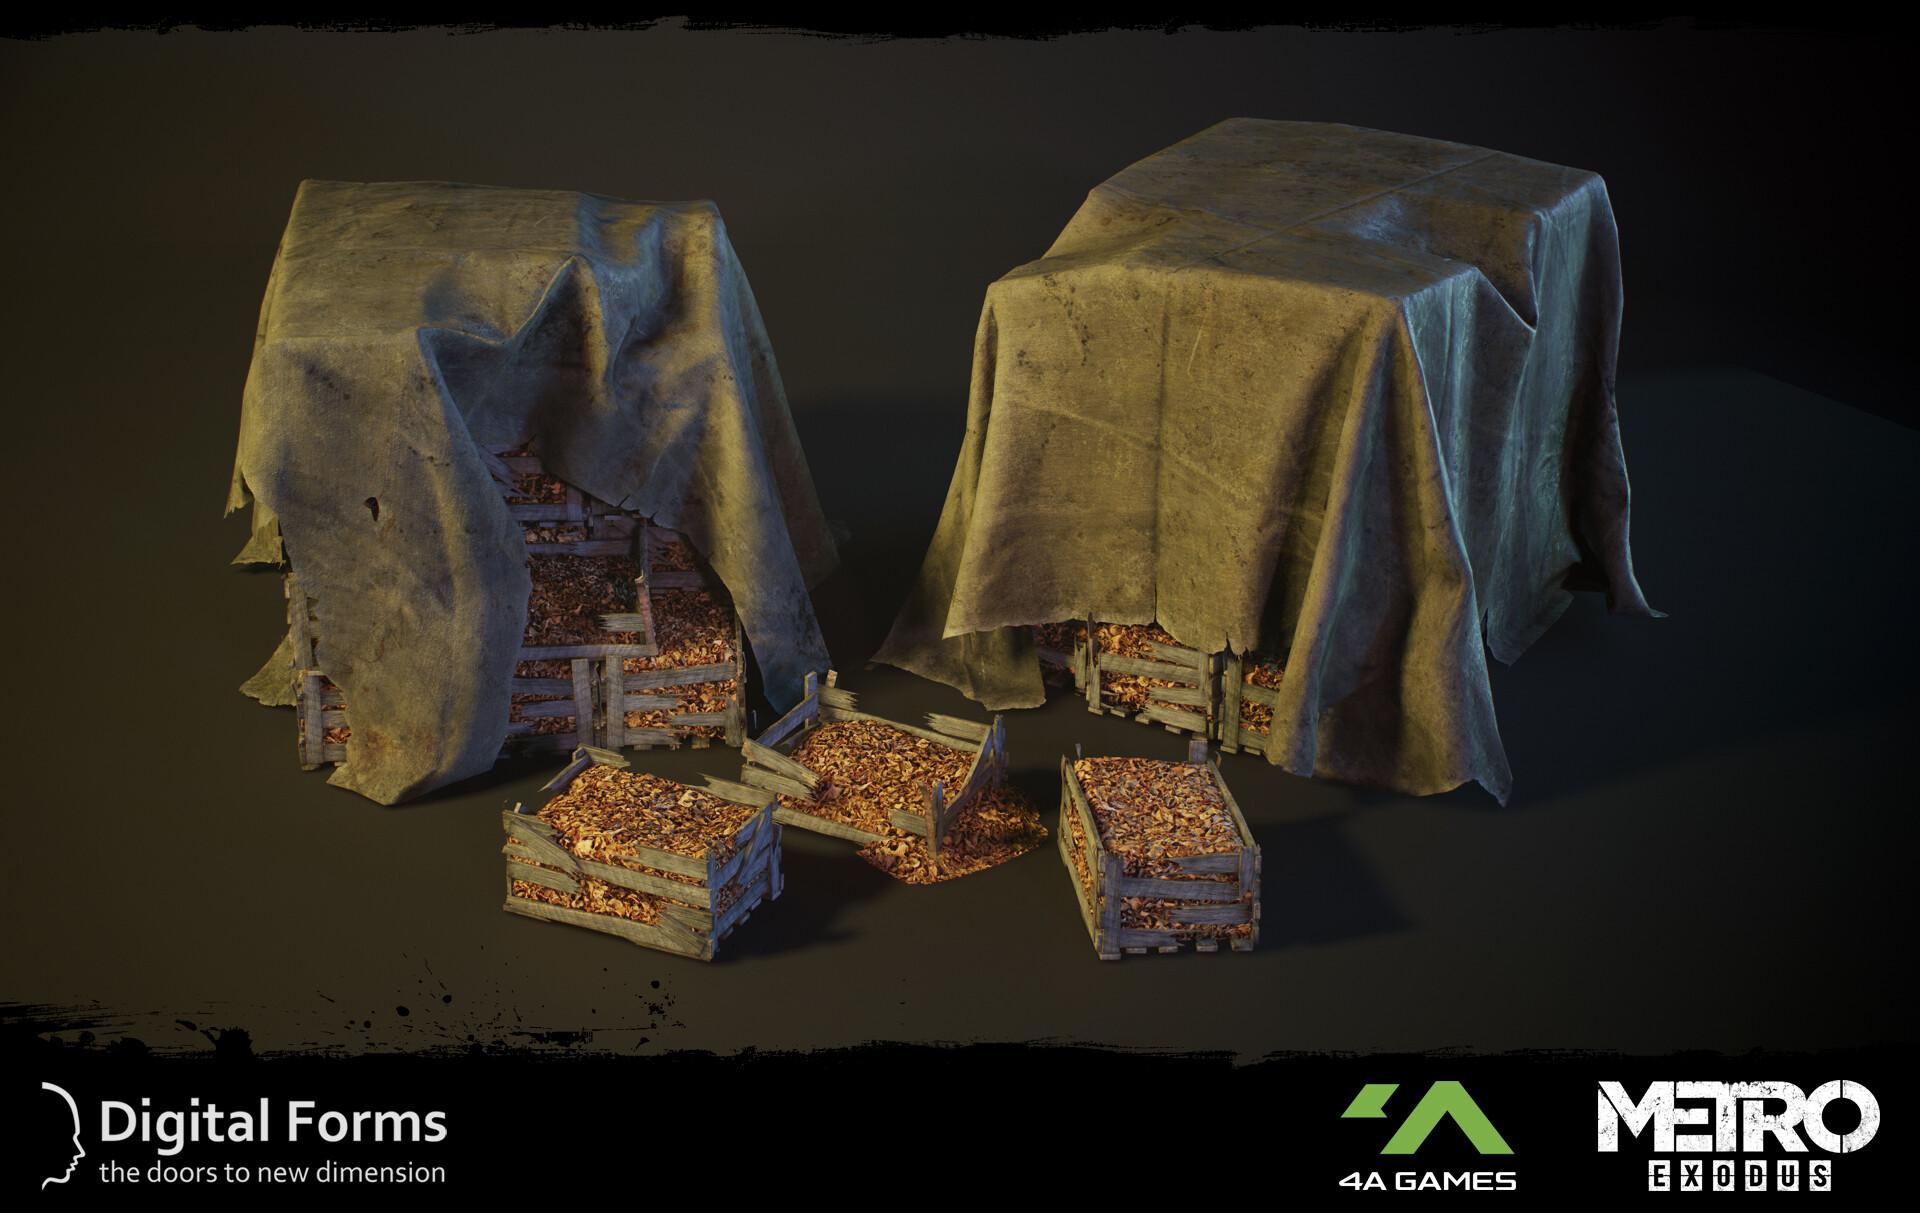 Digital forms mushrooms02